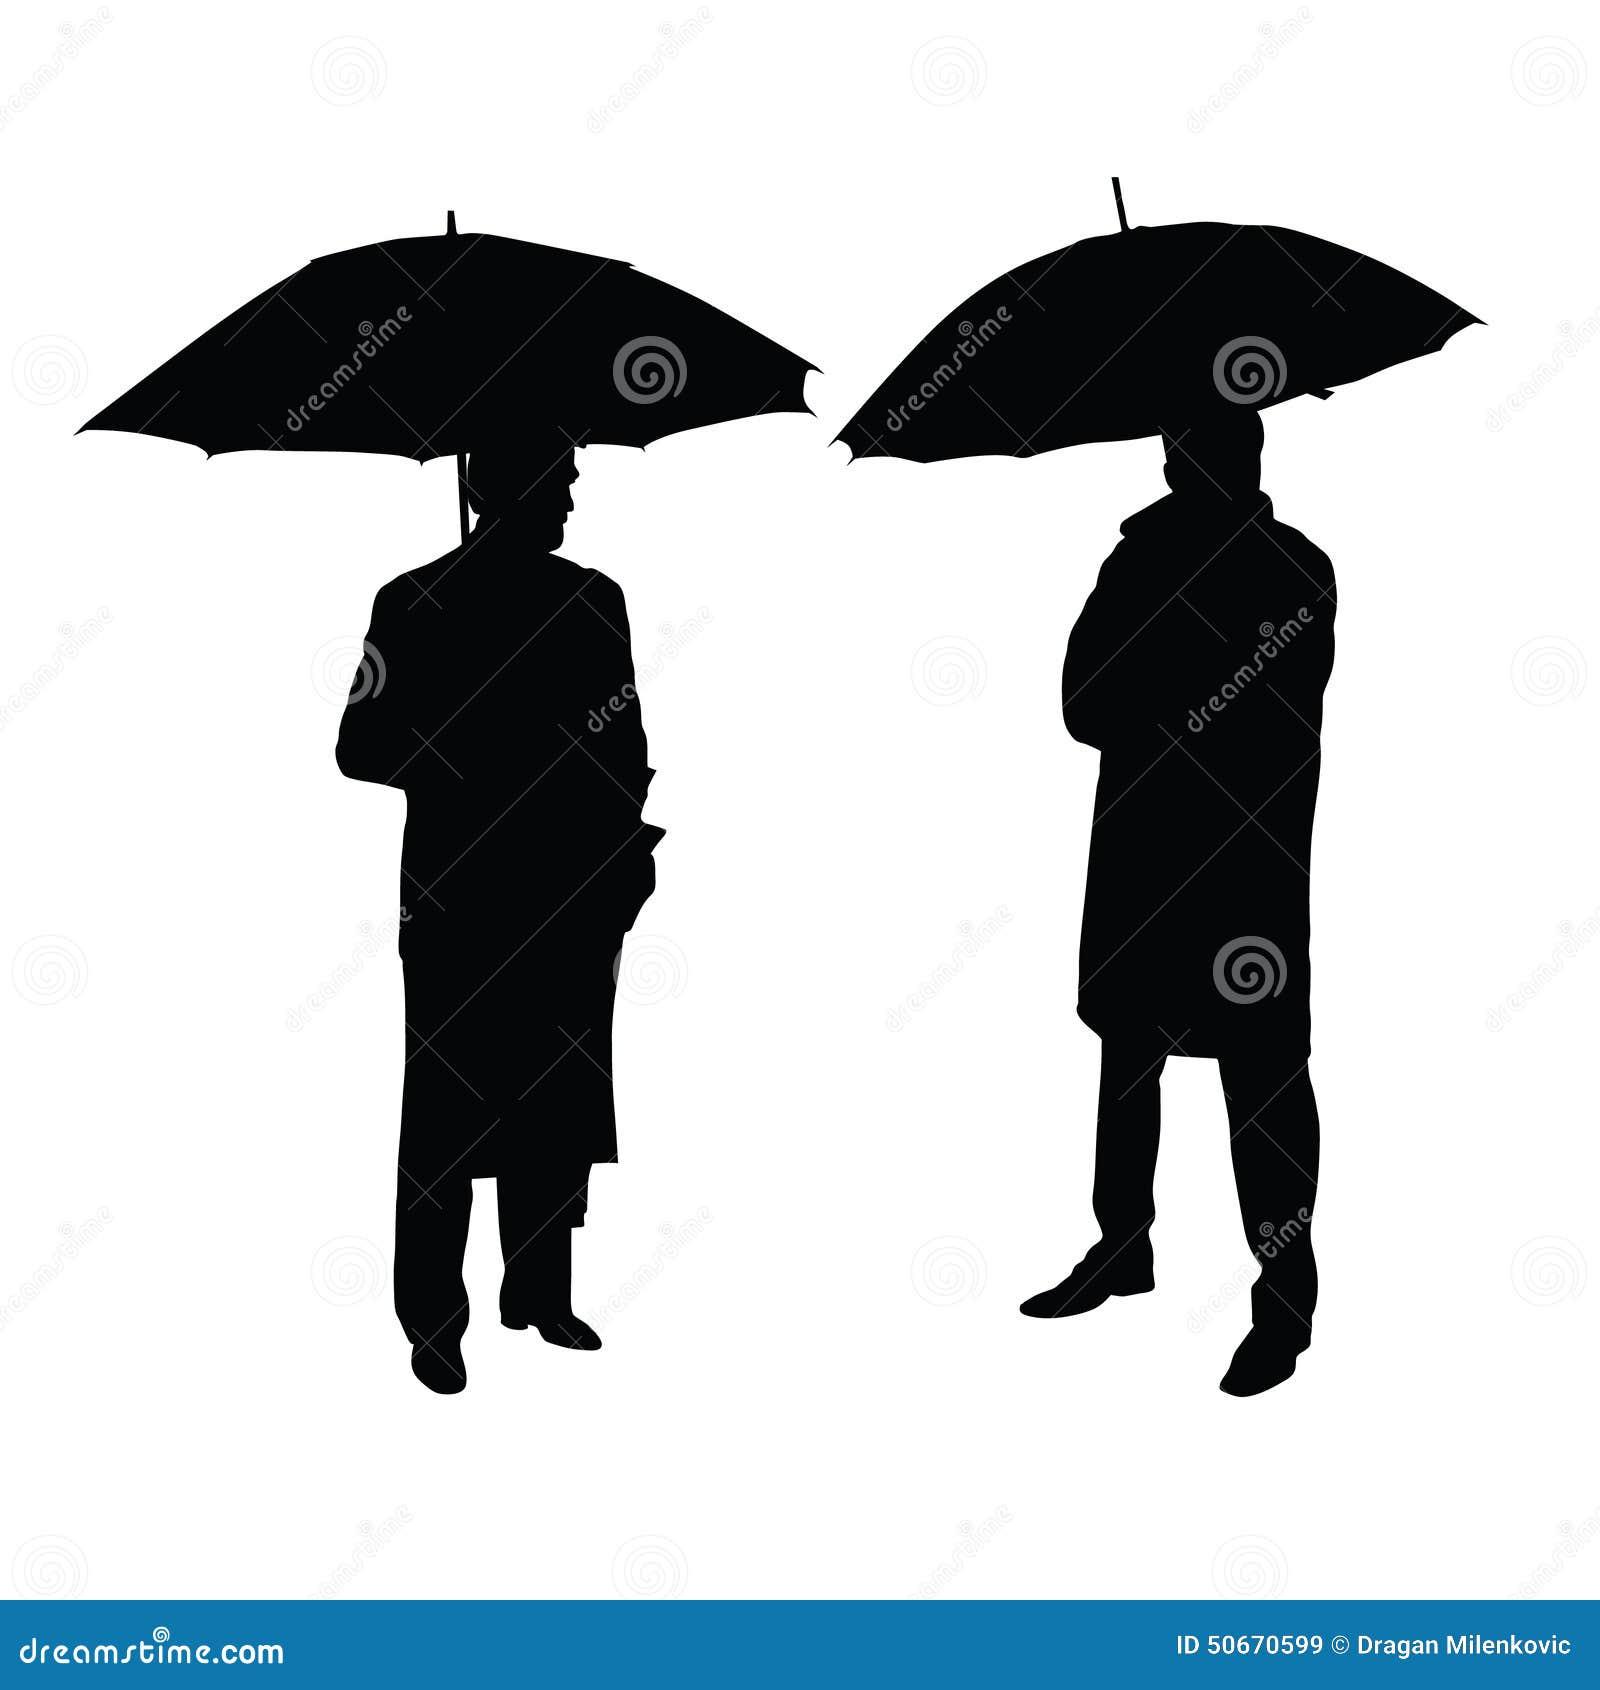 man with umbrella silhouette stock vector illustration